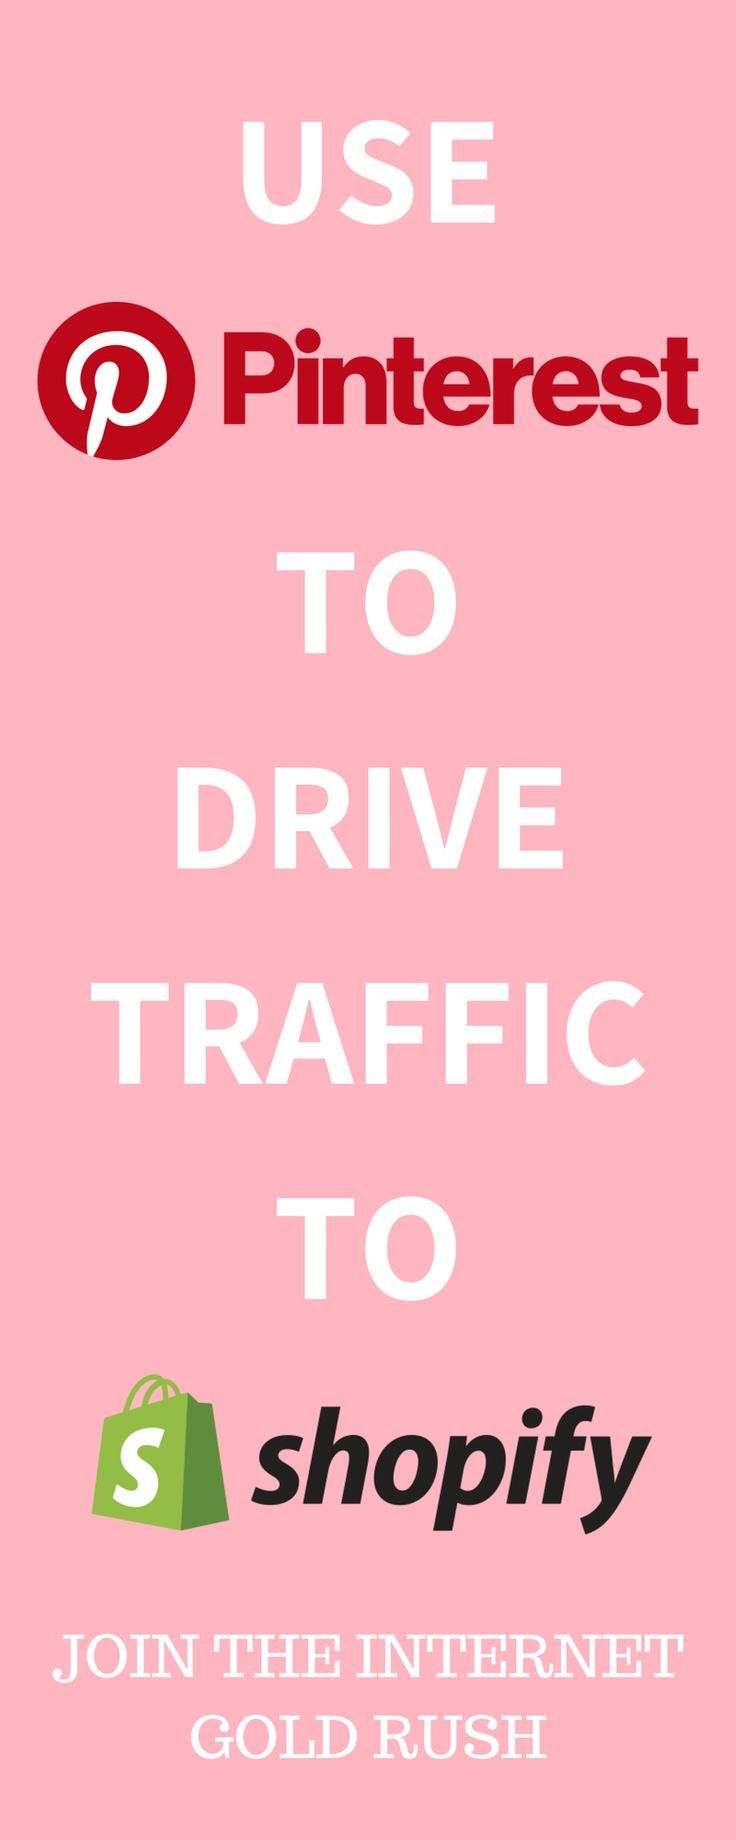 5 HighImpact Strategies for Getting More Traffic